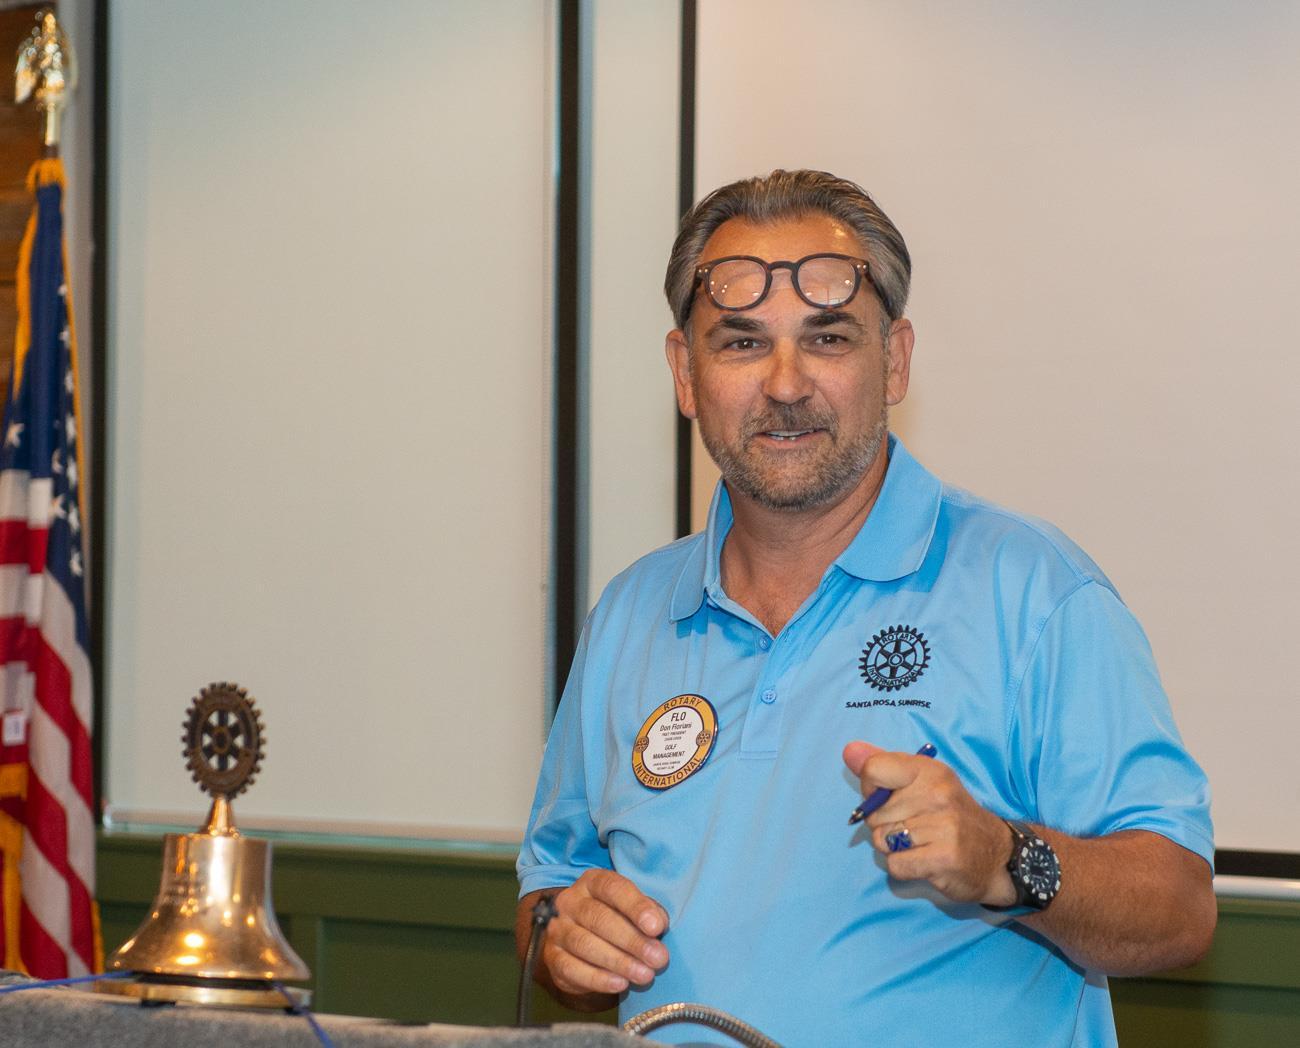 Acting President Don Floriani